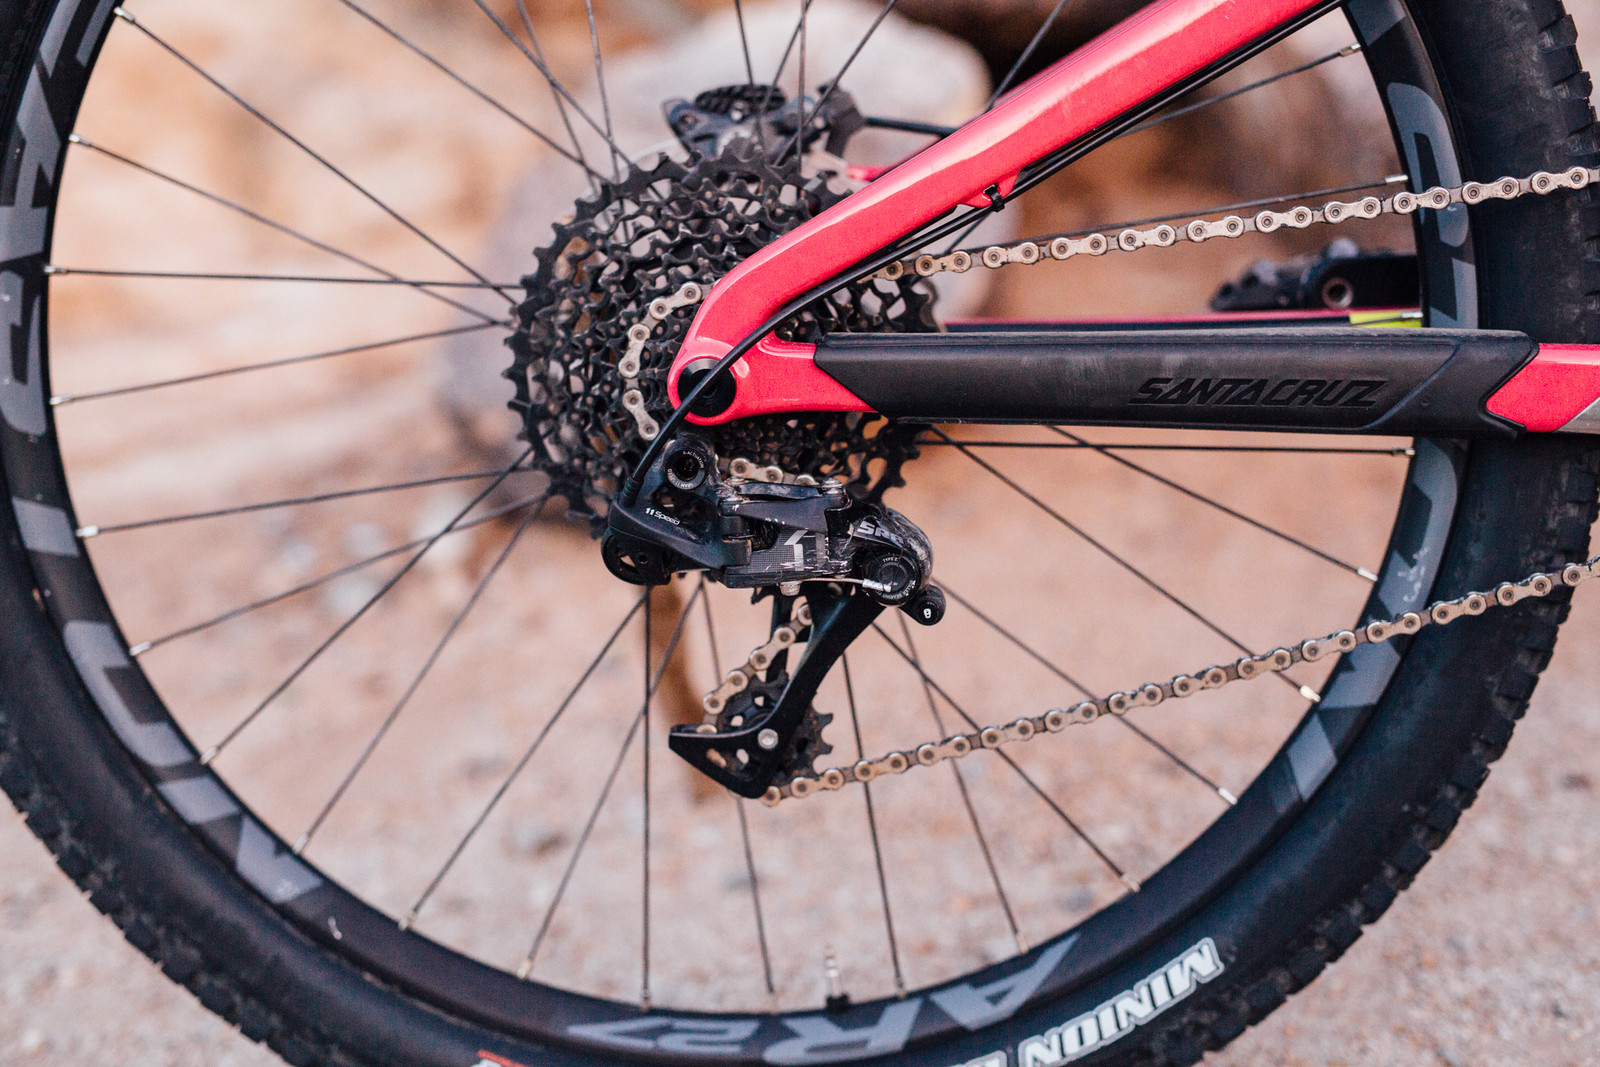 Santa Cruz Bronson C S - 2016 Vital MTB Test Sessions - Santa Cruz Bronson C S - 2016 Vital MTB Test Sessions - Mountain Biking Pictures - Vital MTB